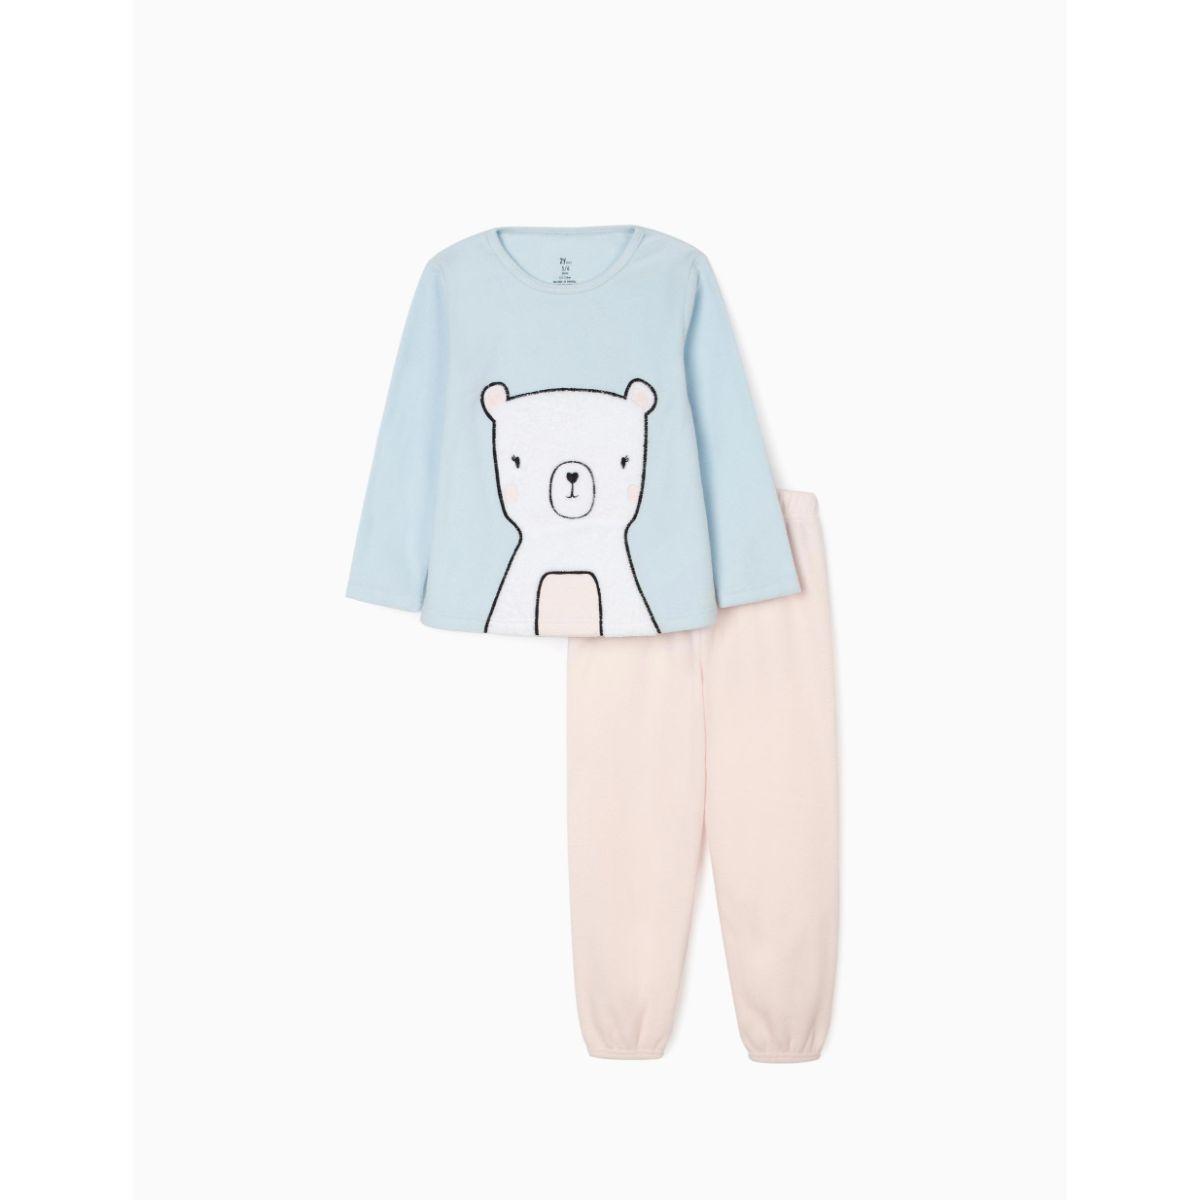 Pijama cu maneca lunga, Zippy, Zy Girl, model cu ursulet